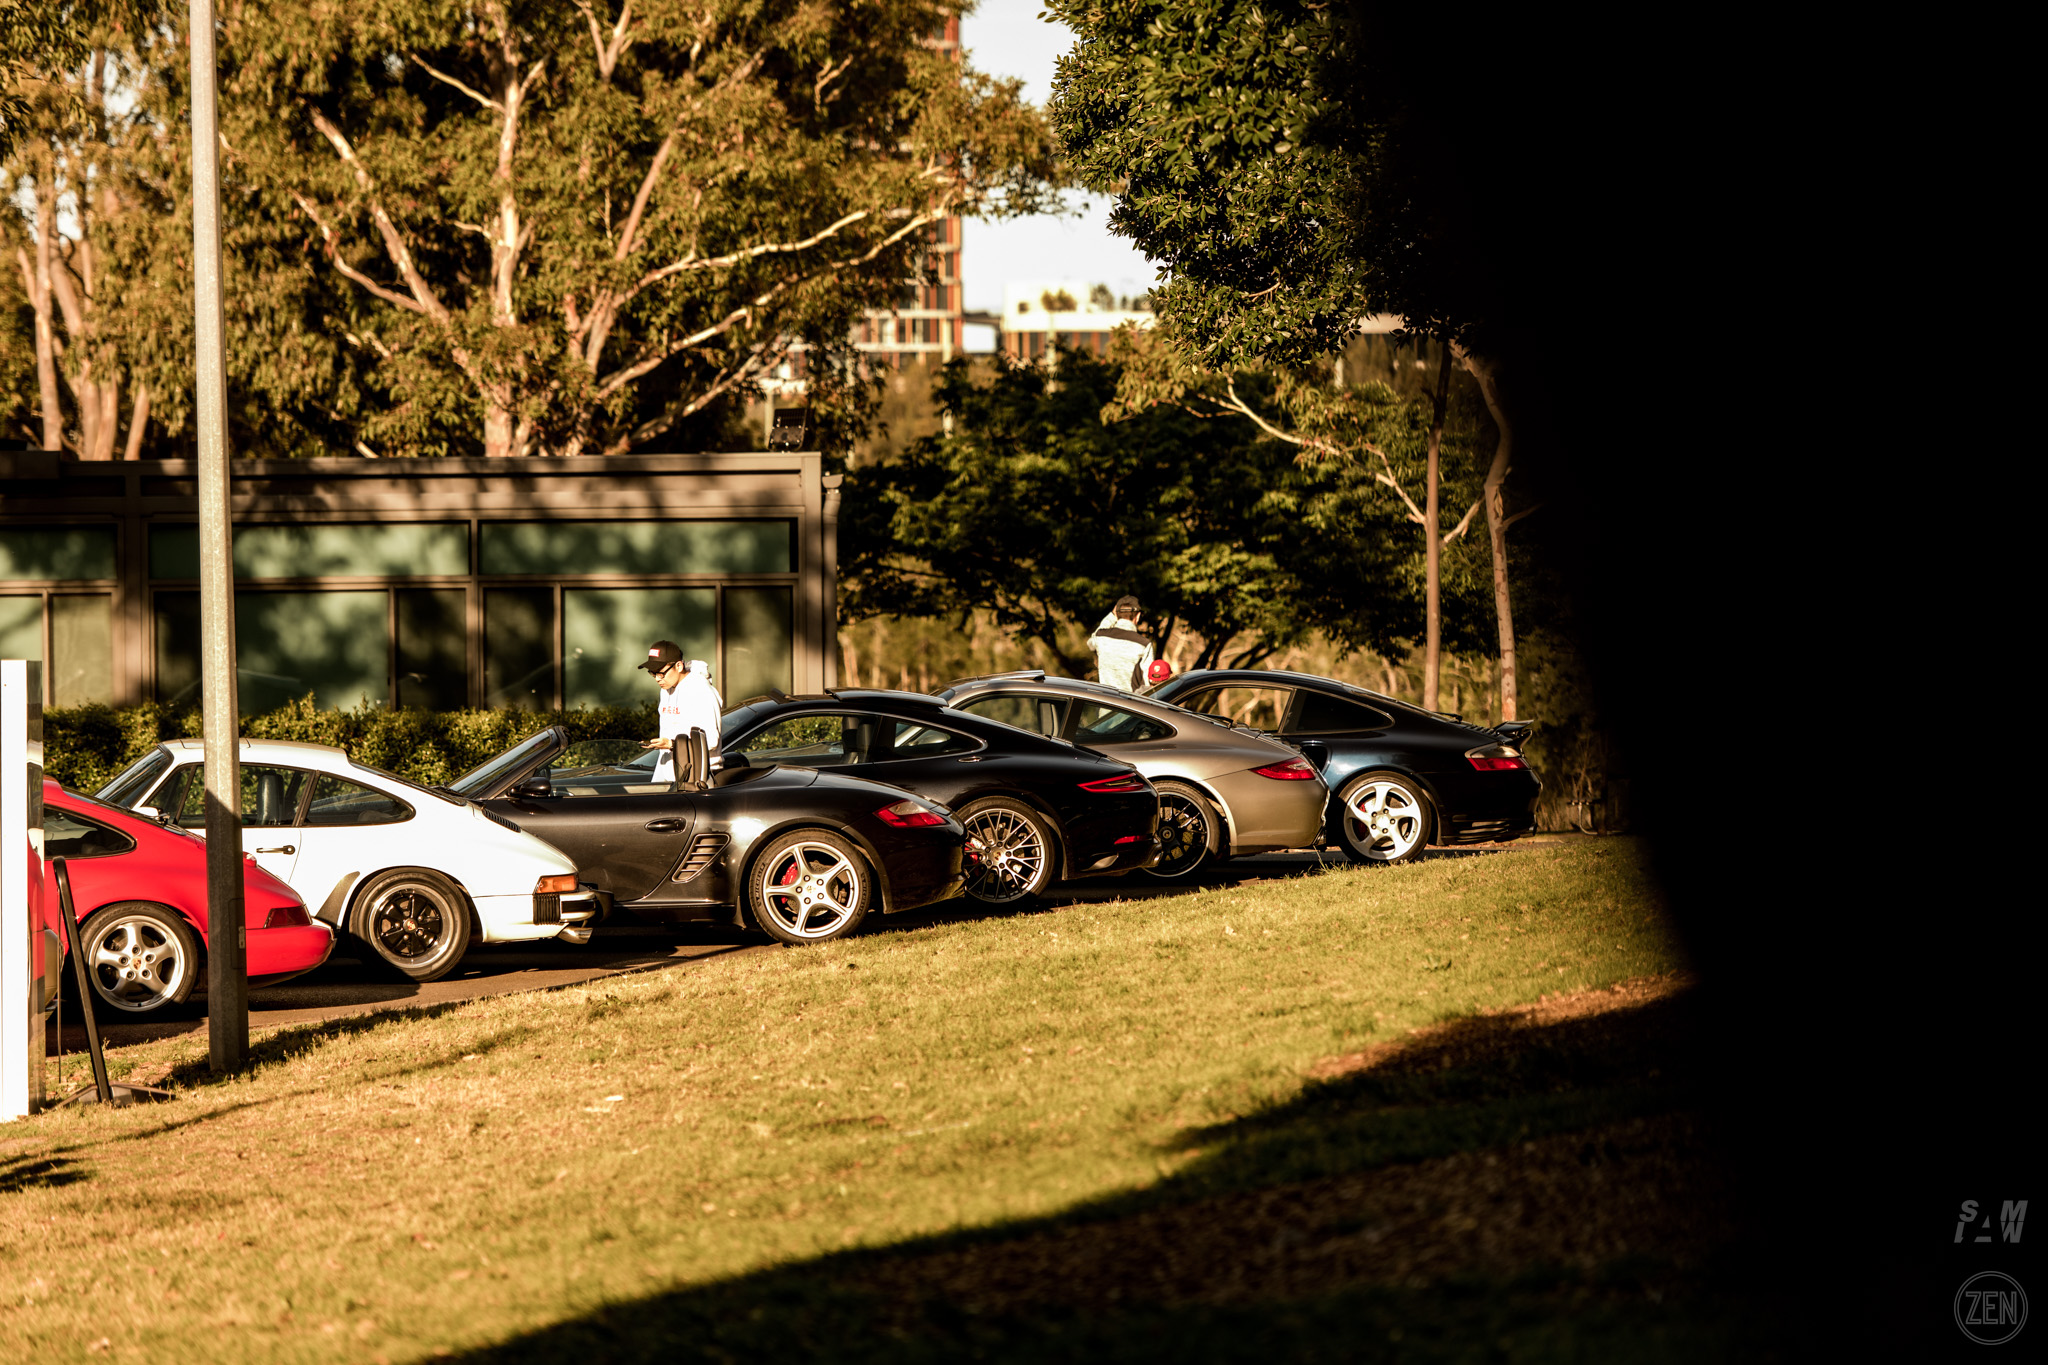 2019-10-27 - Autohaus Porsches & Coffee 070